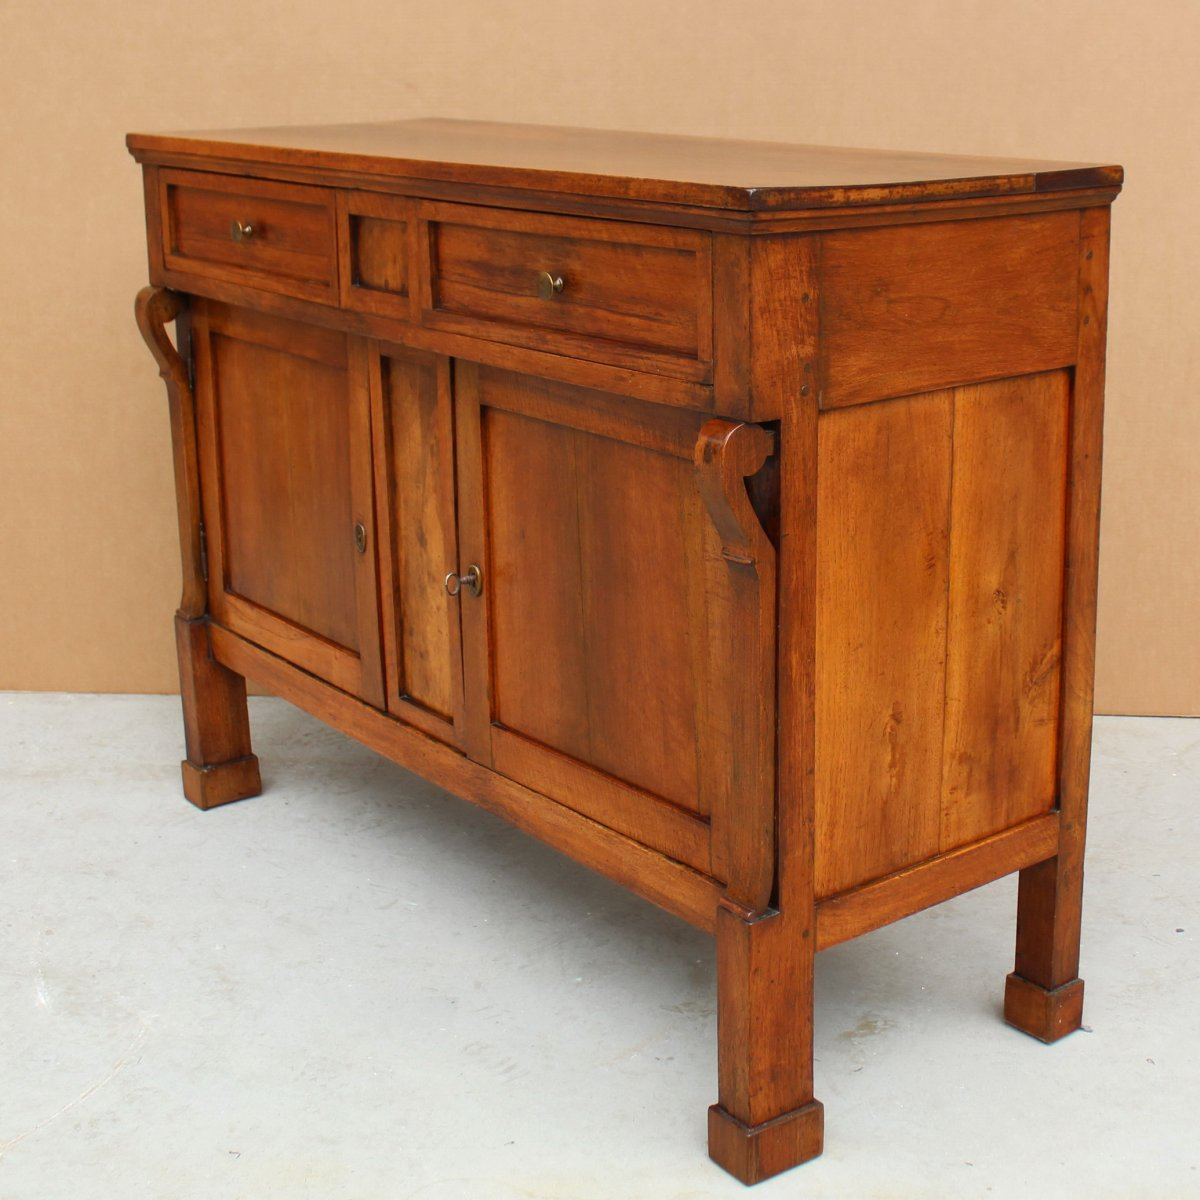 Antique Empire Sideboard Dresser Cabinet Cupboard Buffet In Walnut - Italy 19th-photo-3